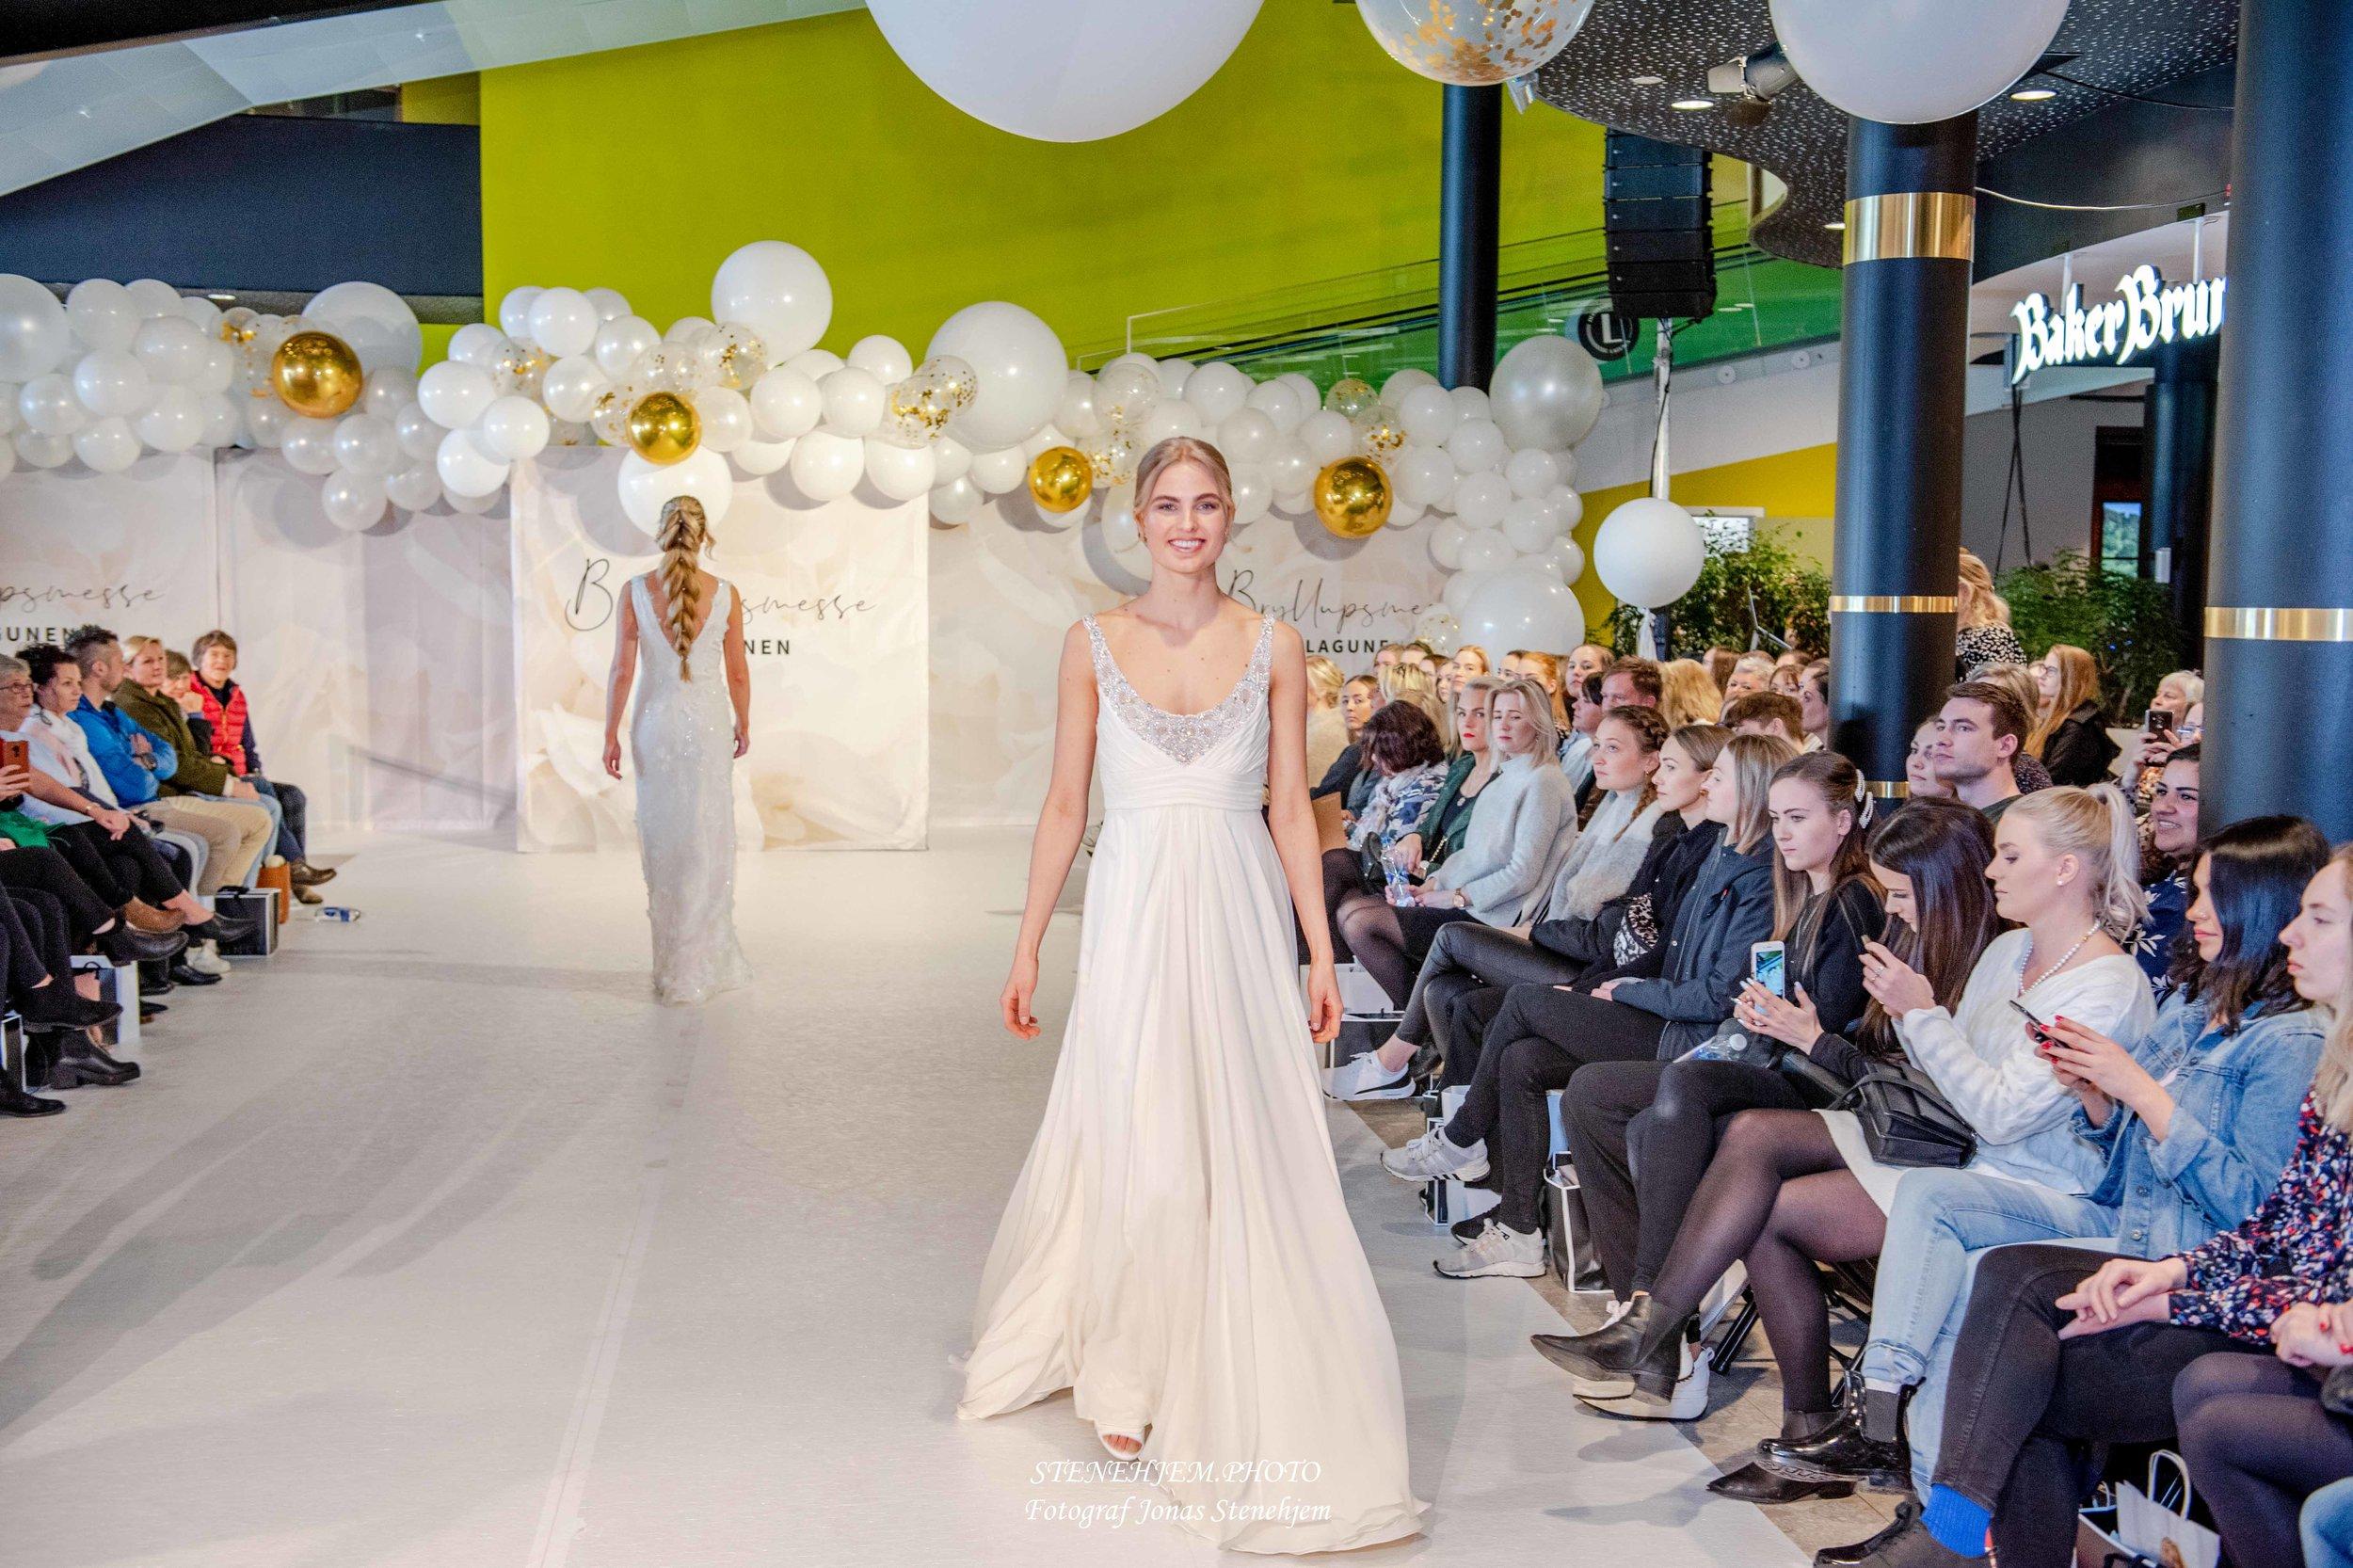 Bryllupsmesse_Lagunen_mittaltweddingfair__041.jpg